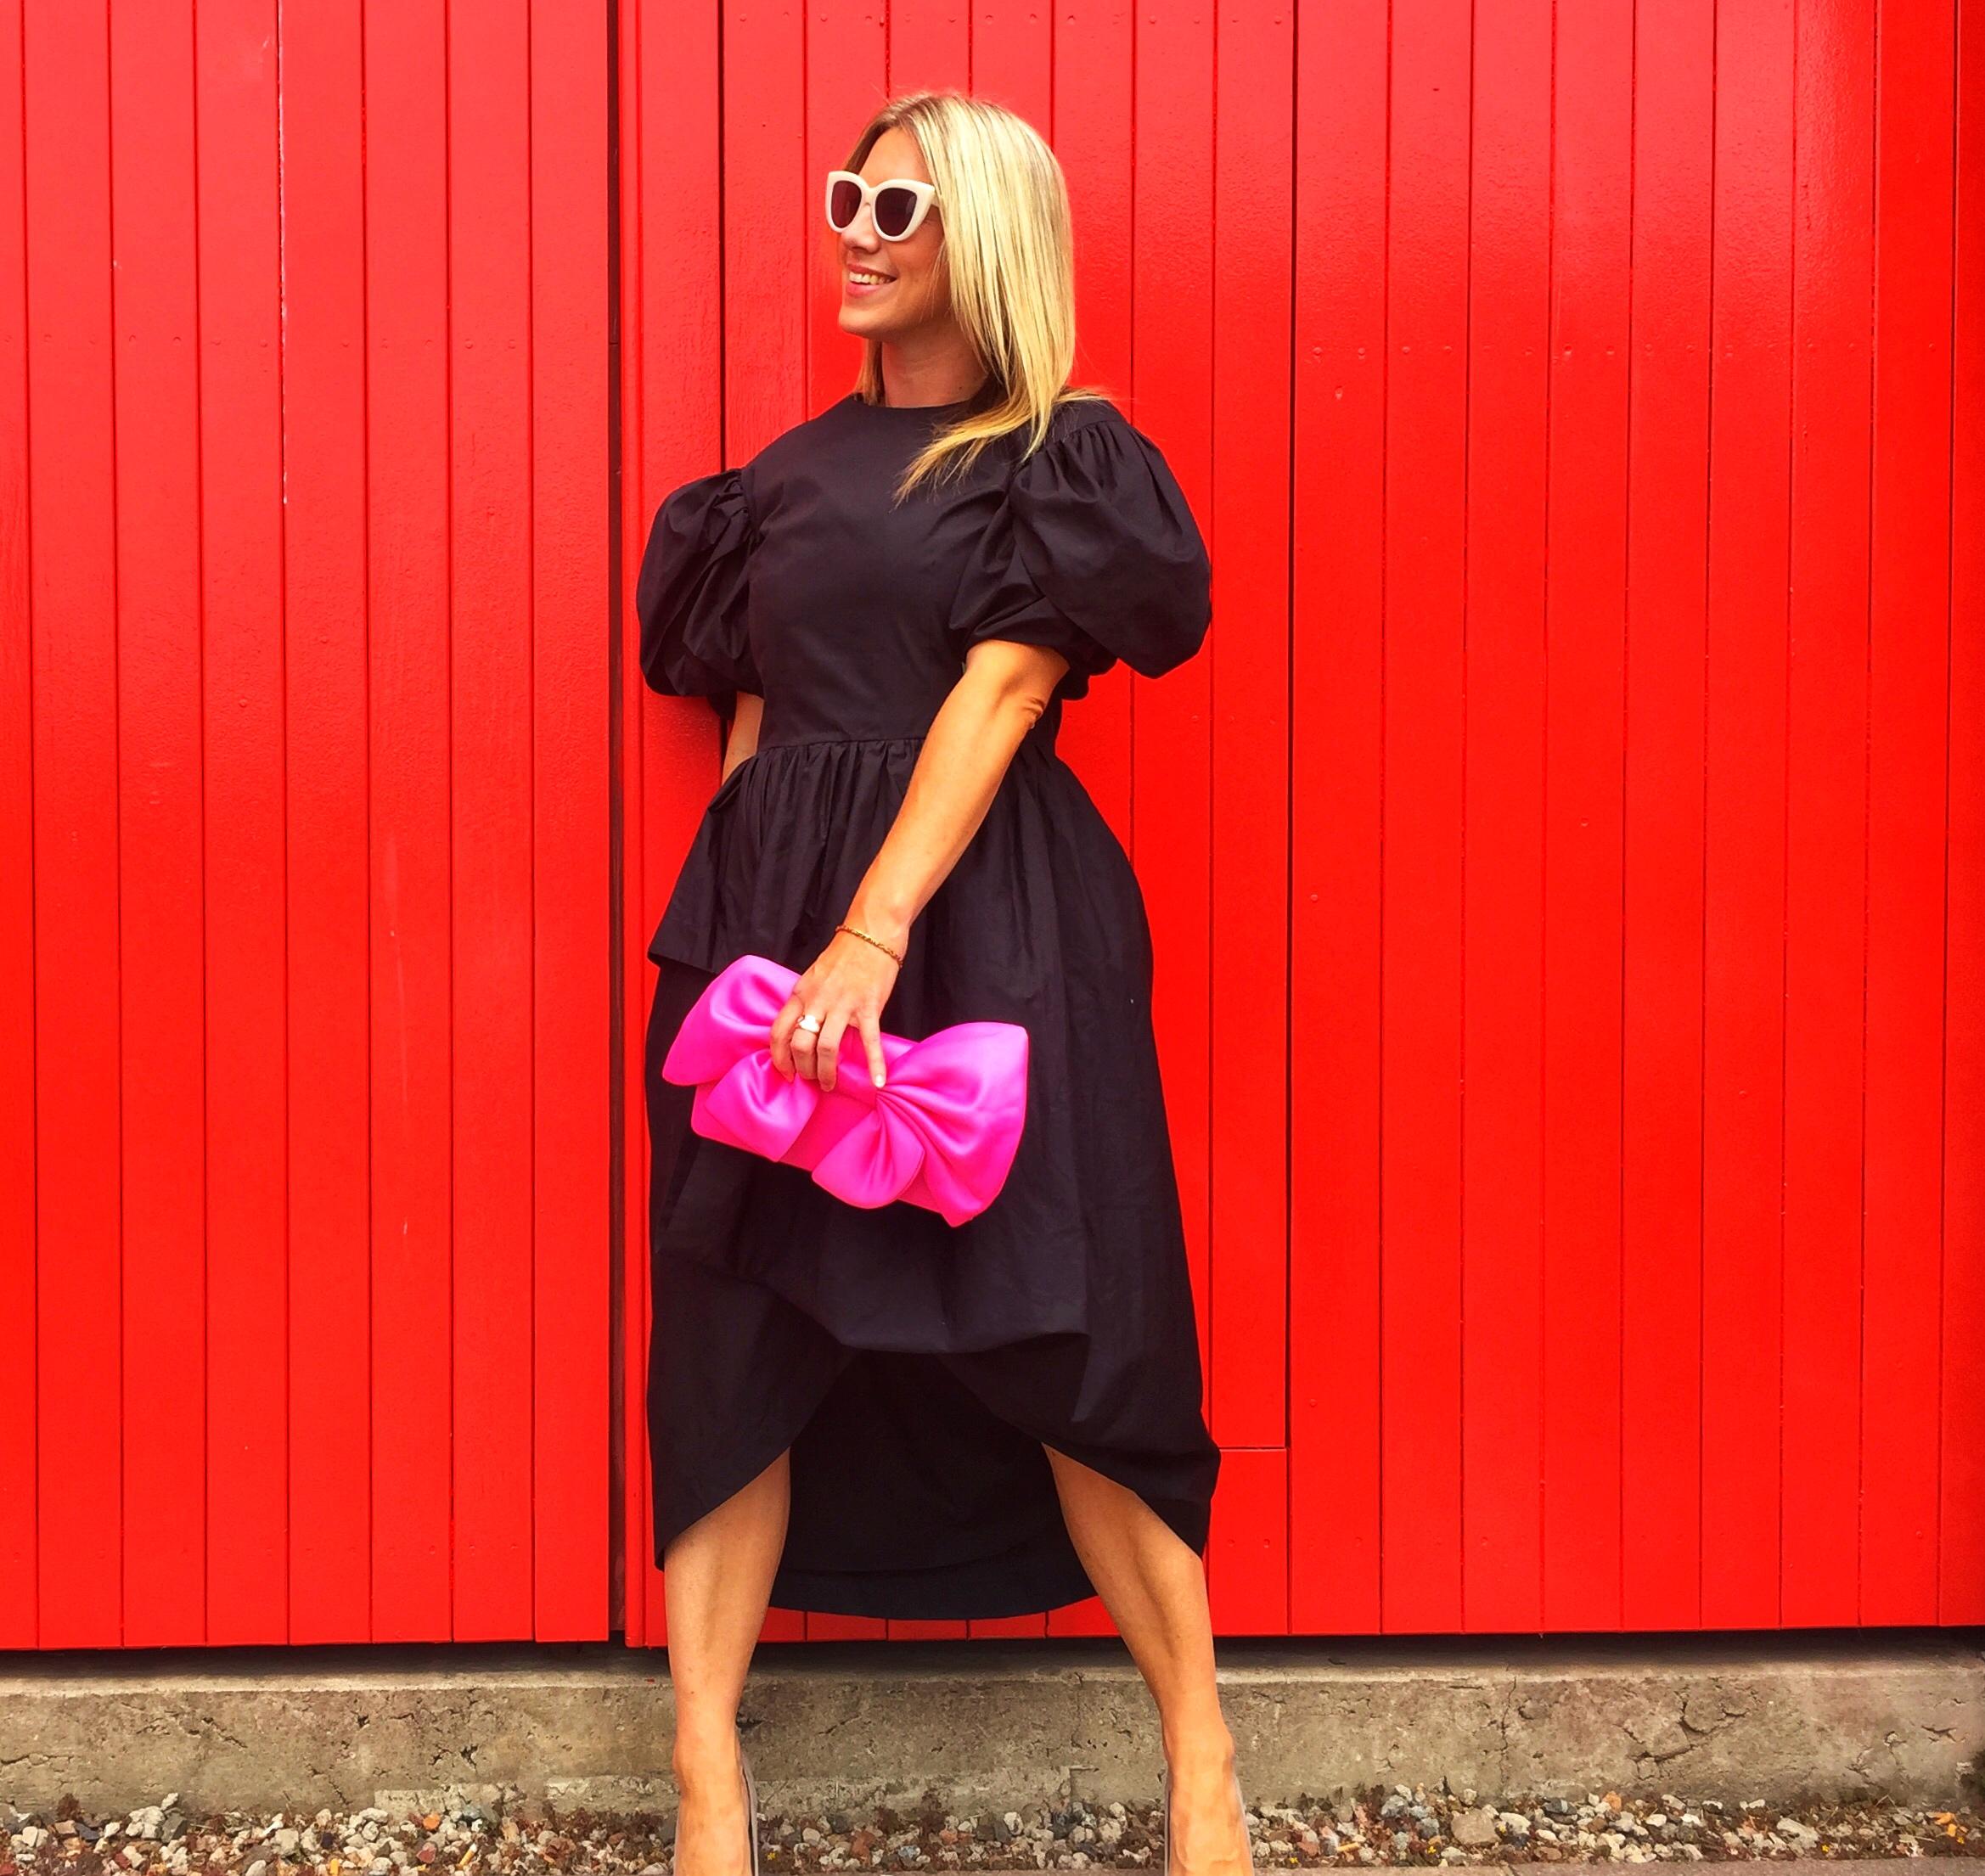 Dress by Simone Rocha